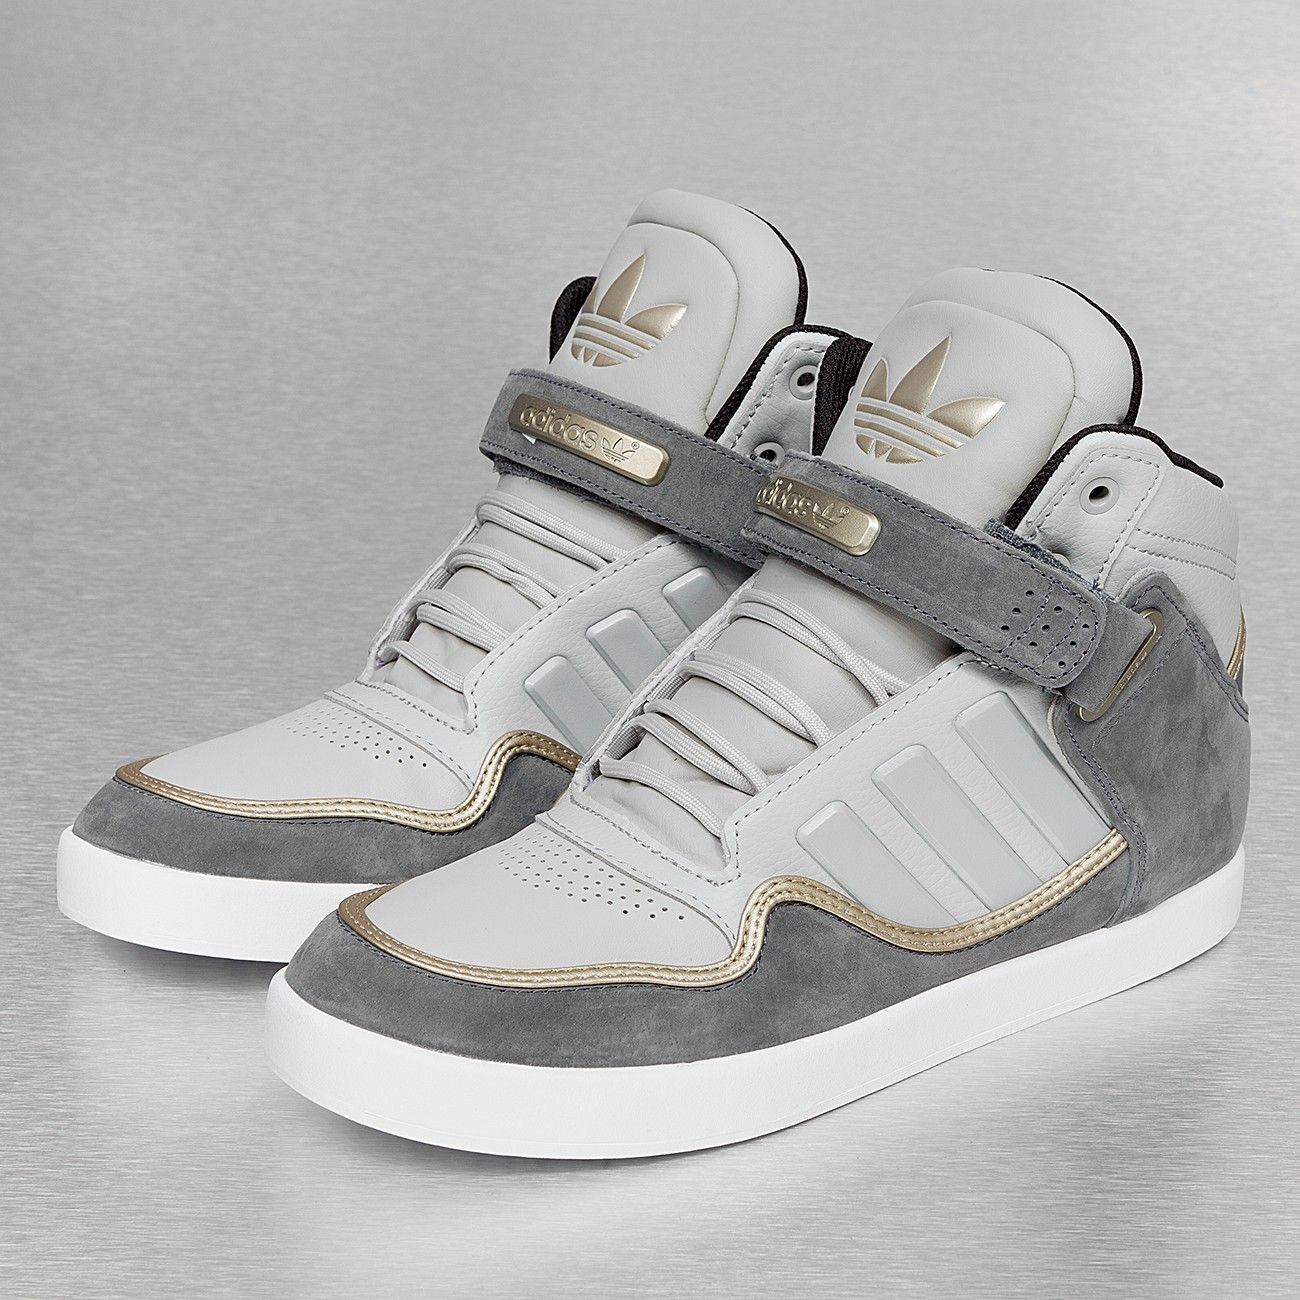 the latest 89403 bc907 Adidas Baskets gris   la mode à mes pieds   Adidas, Adidas originals et  Sneakers